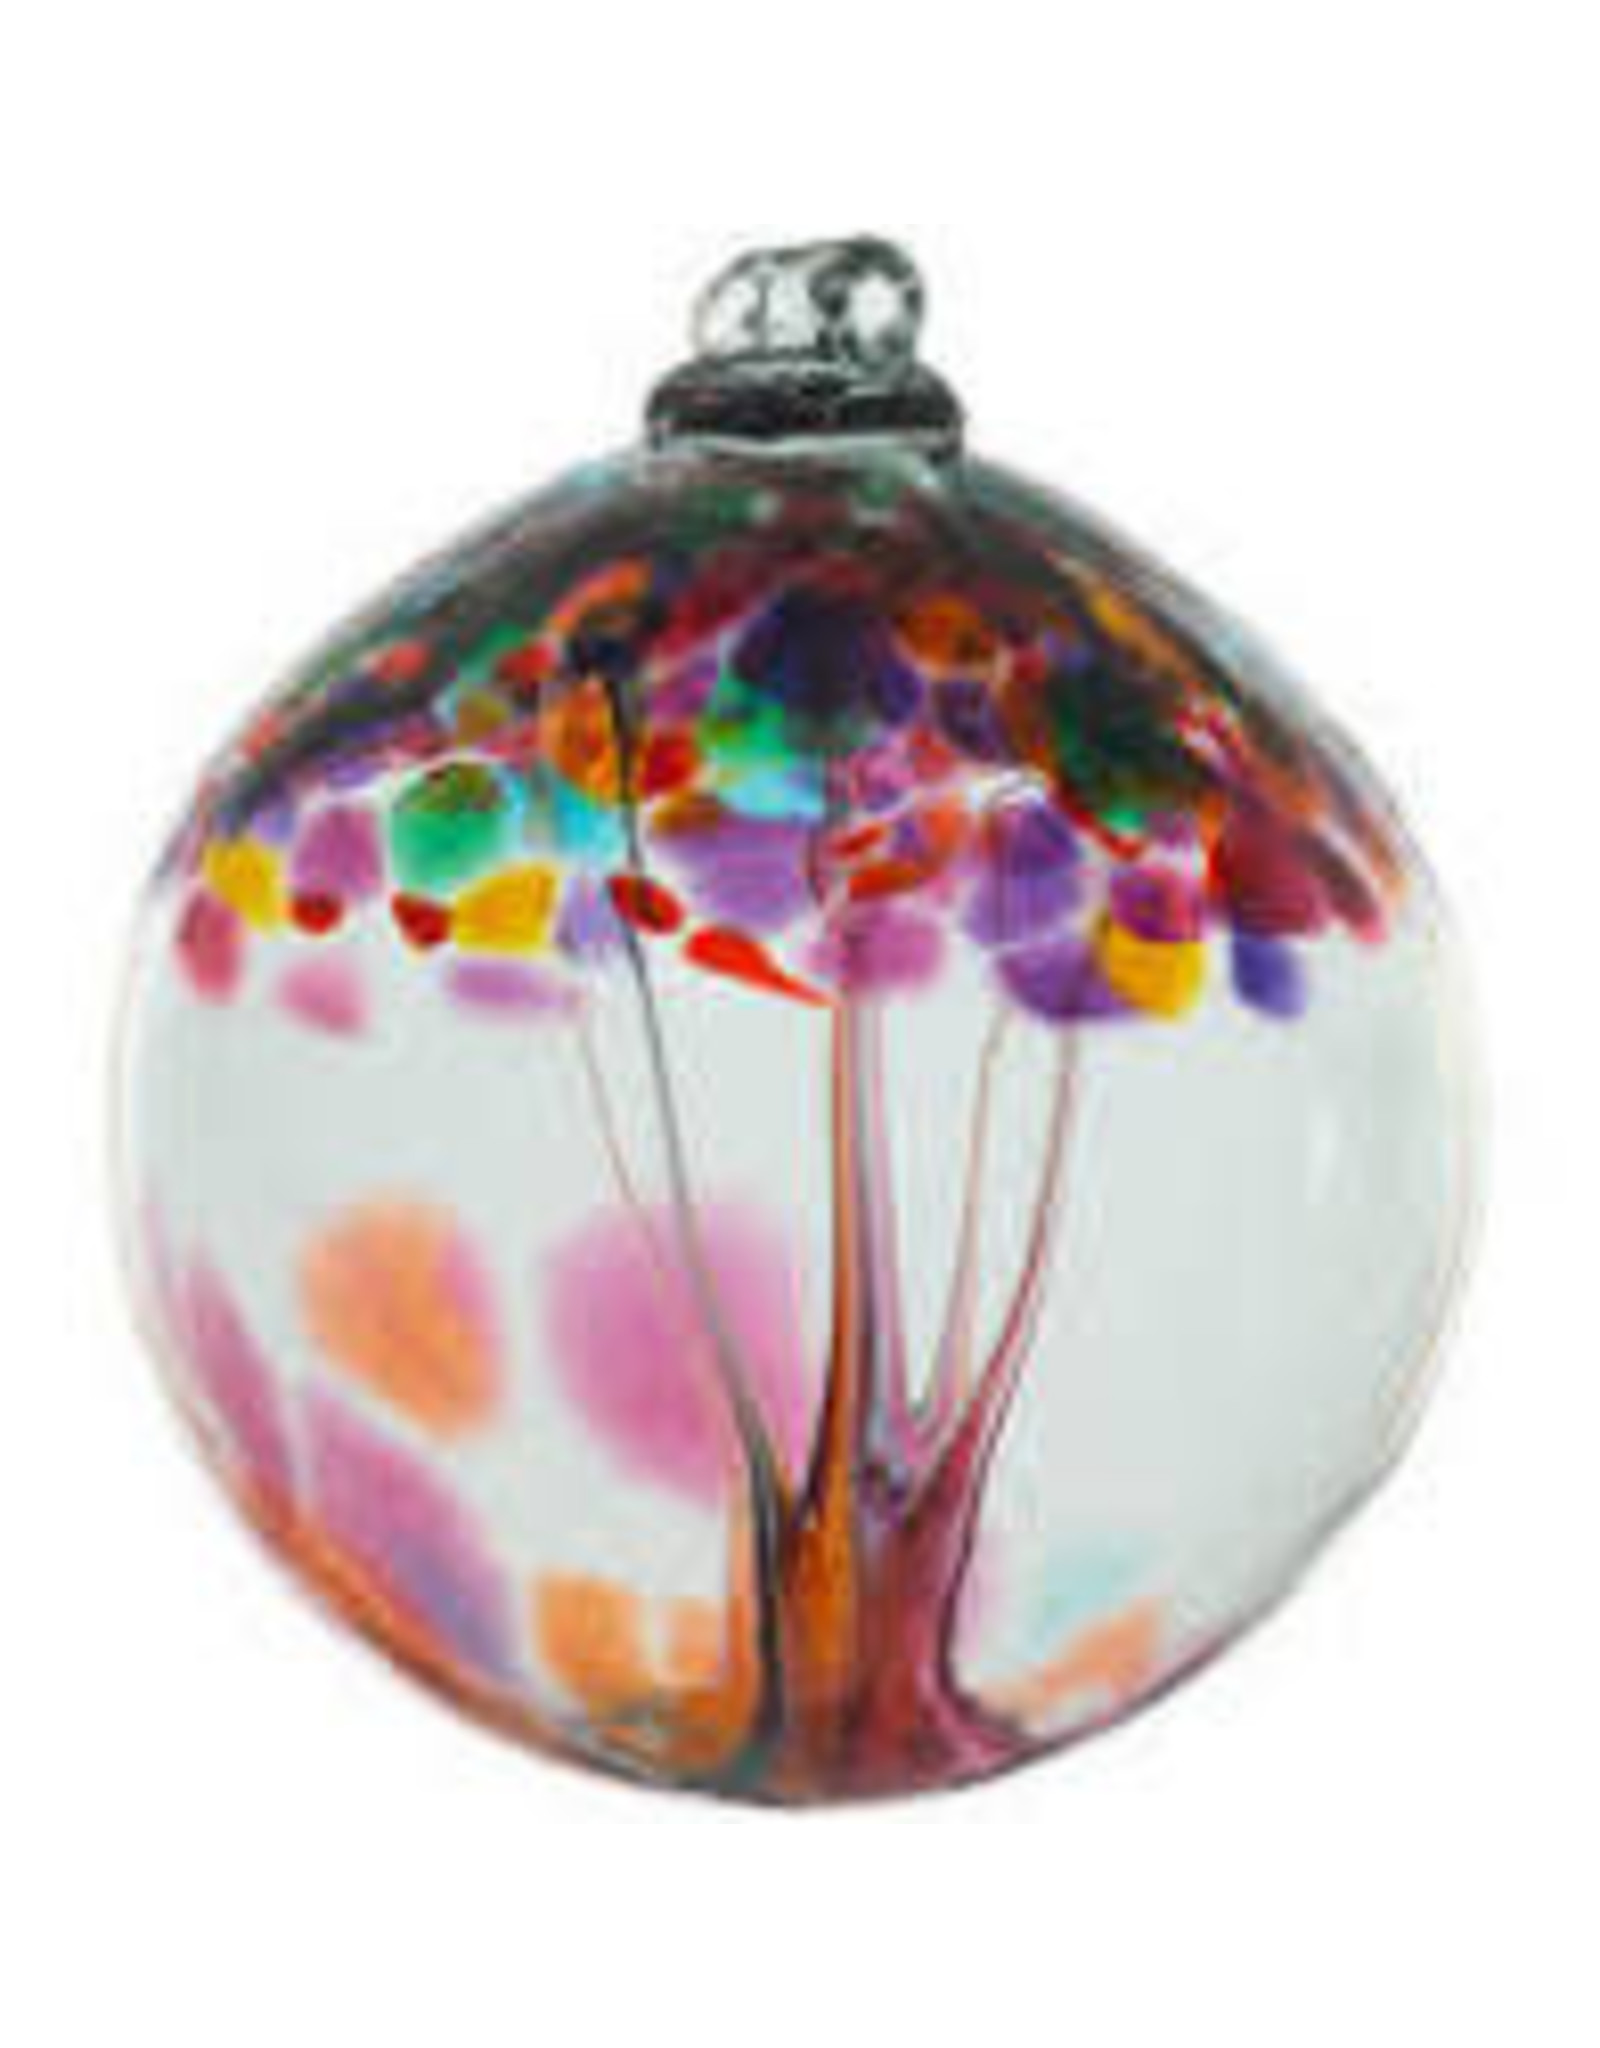 "Kitras Art Glass GRATITUDE (Trees of Enchantment, 6"" D., KITRAS)"